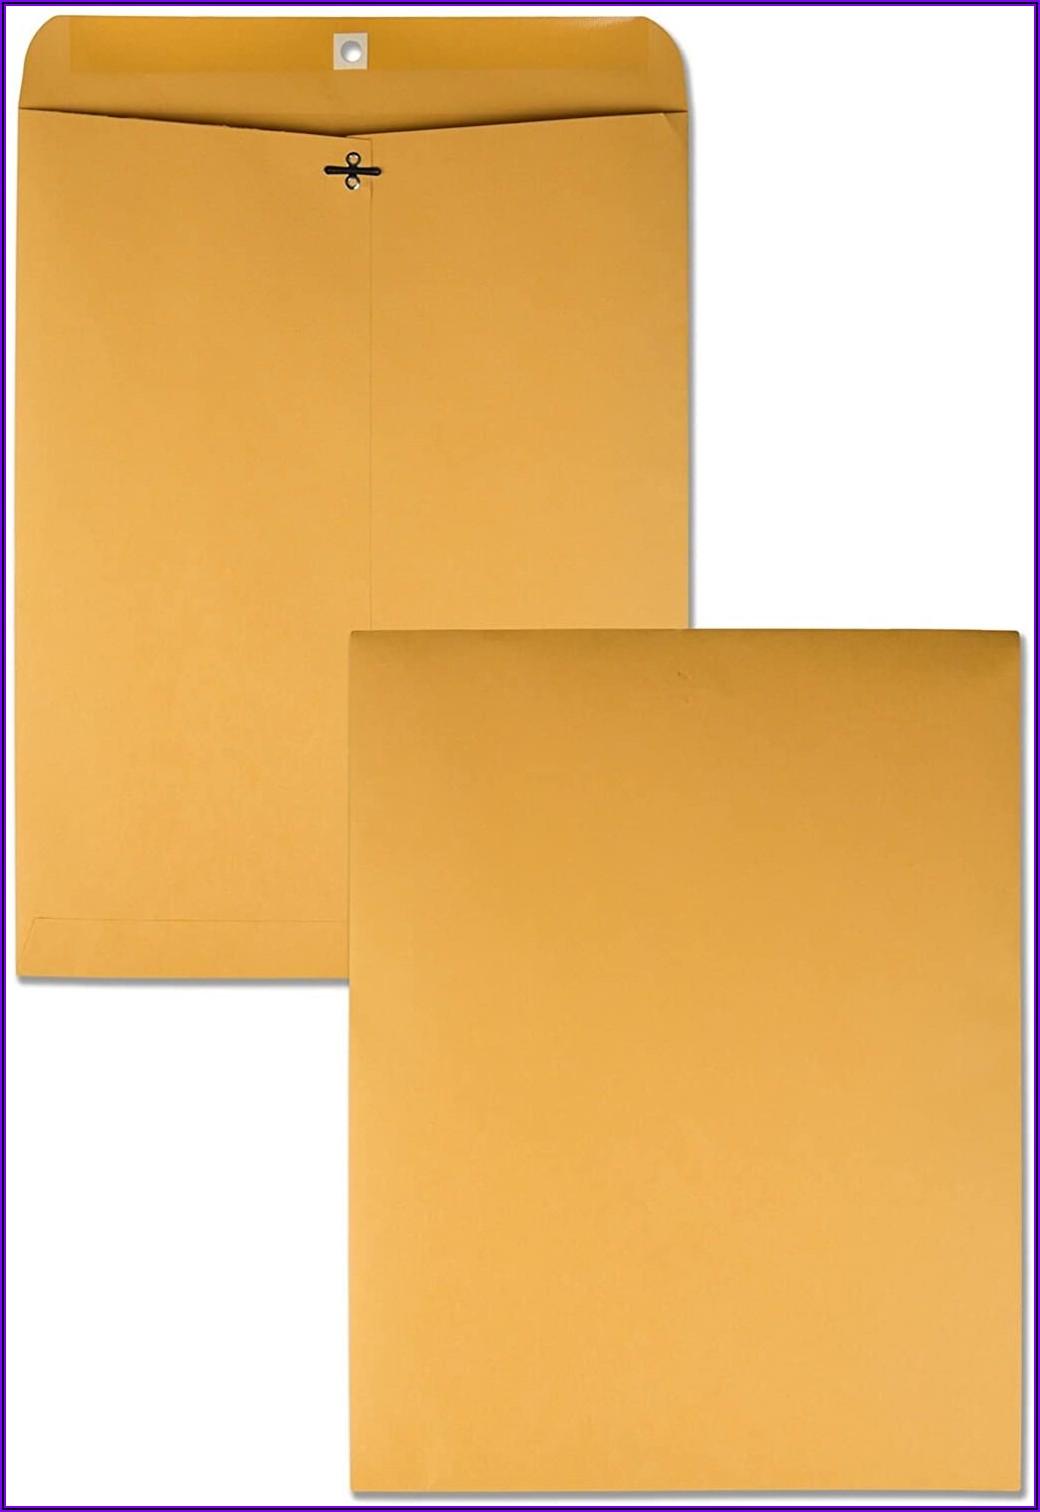 Office Depot 9x12 Clasp Envelopes